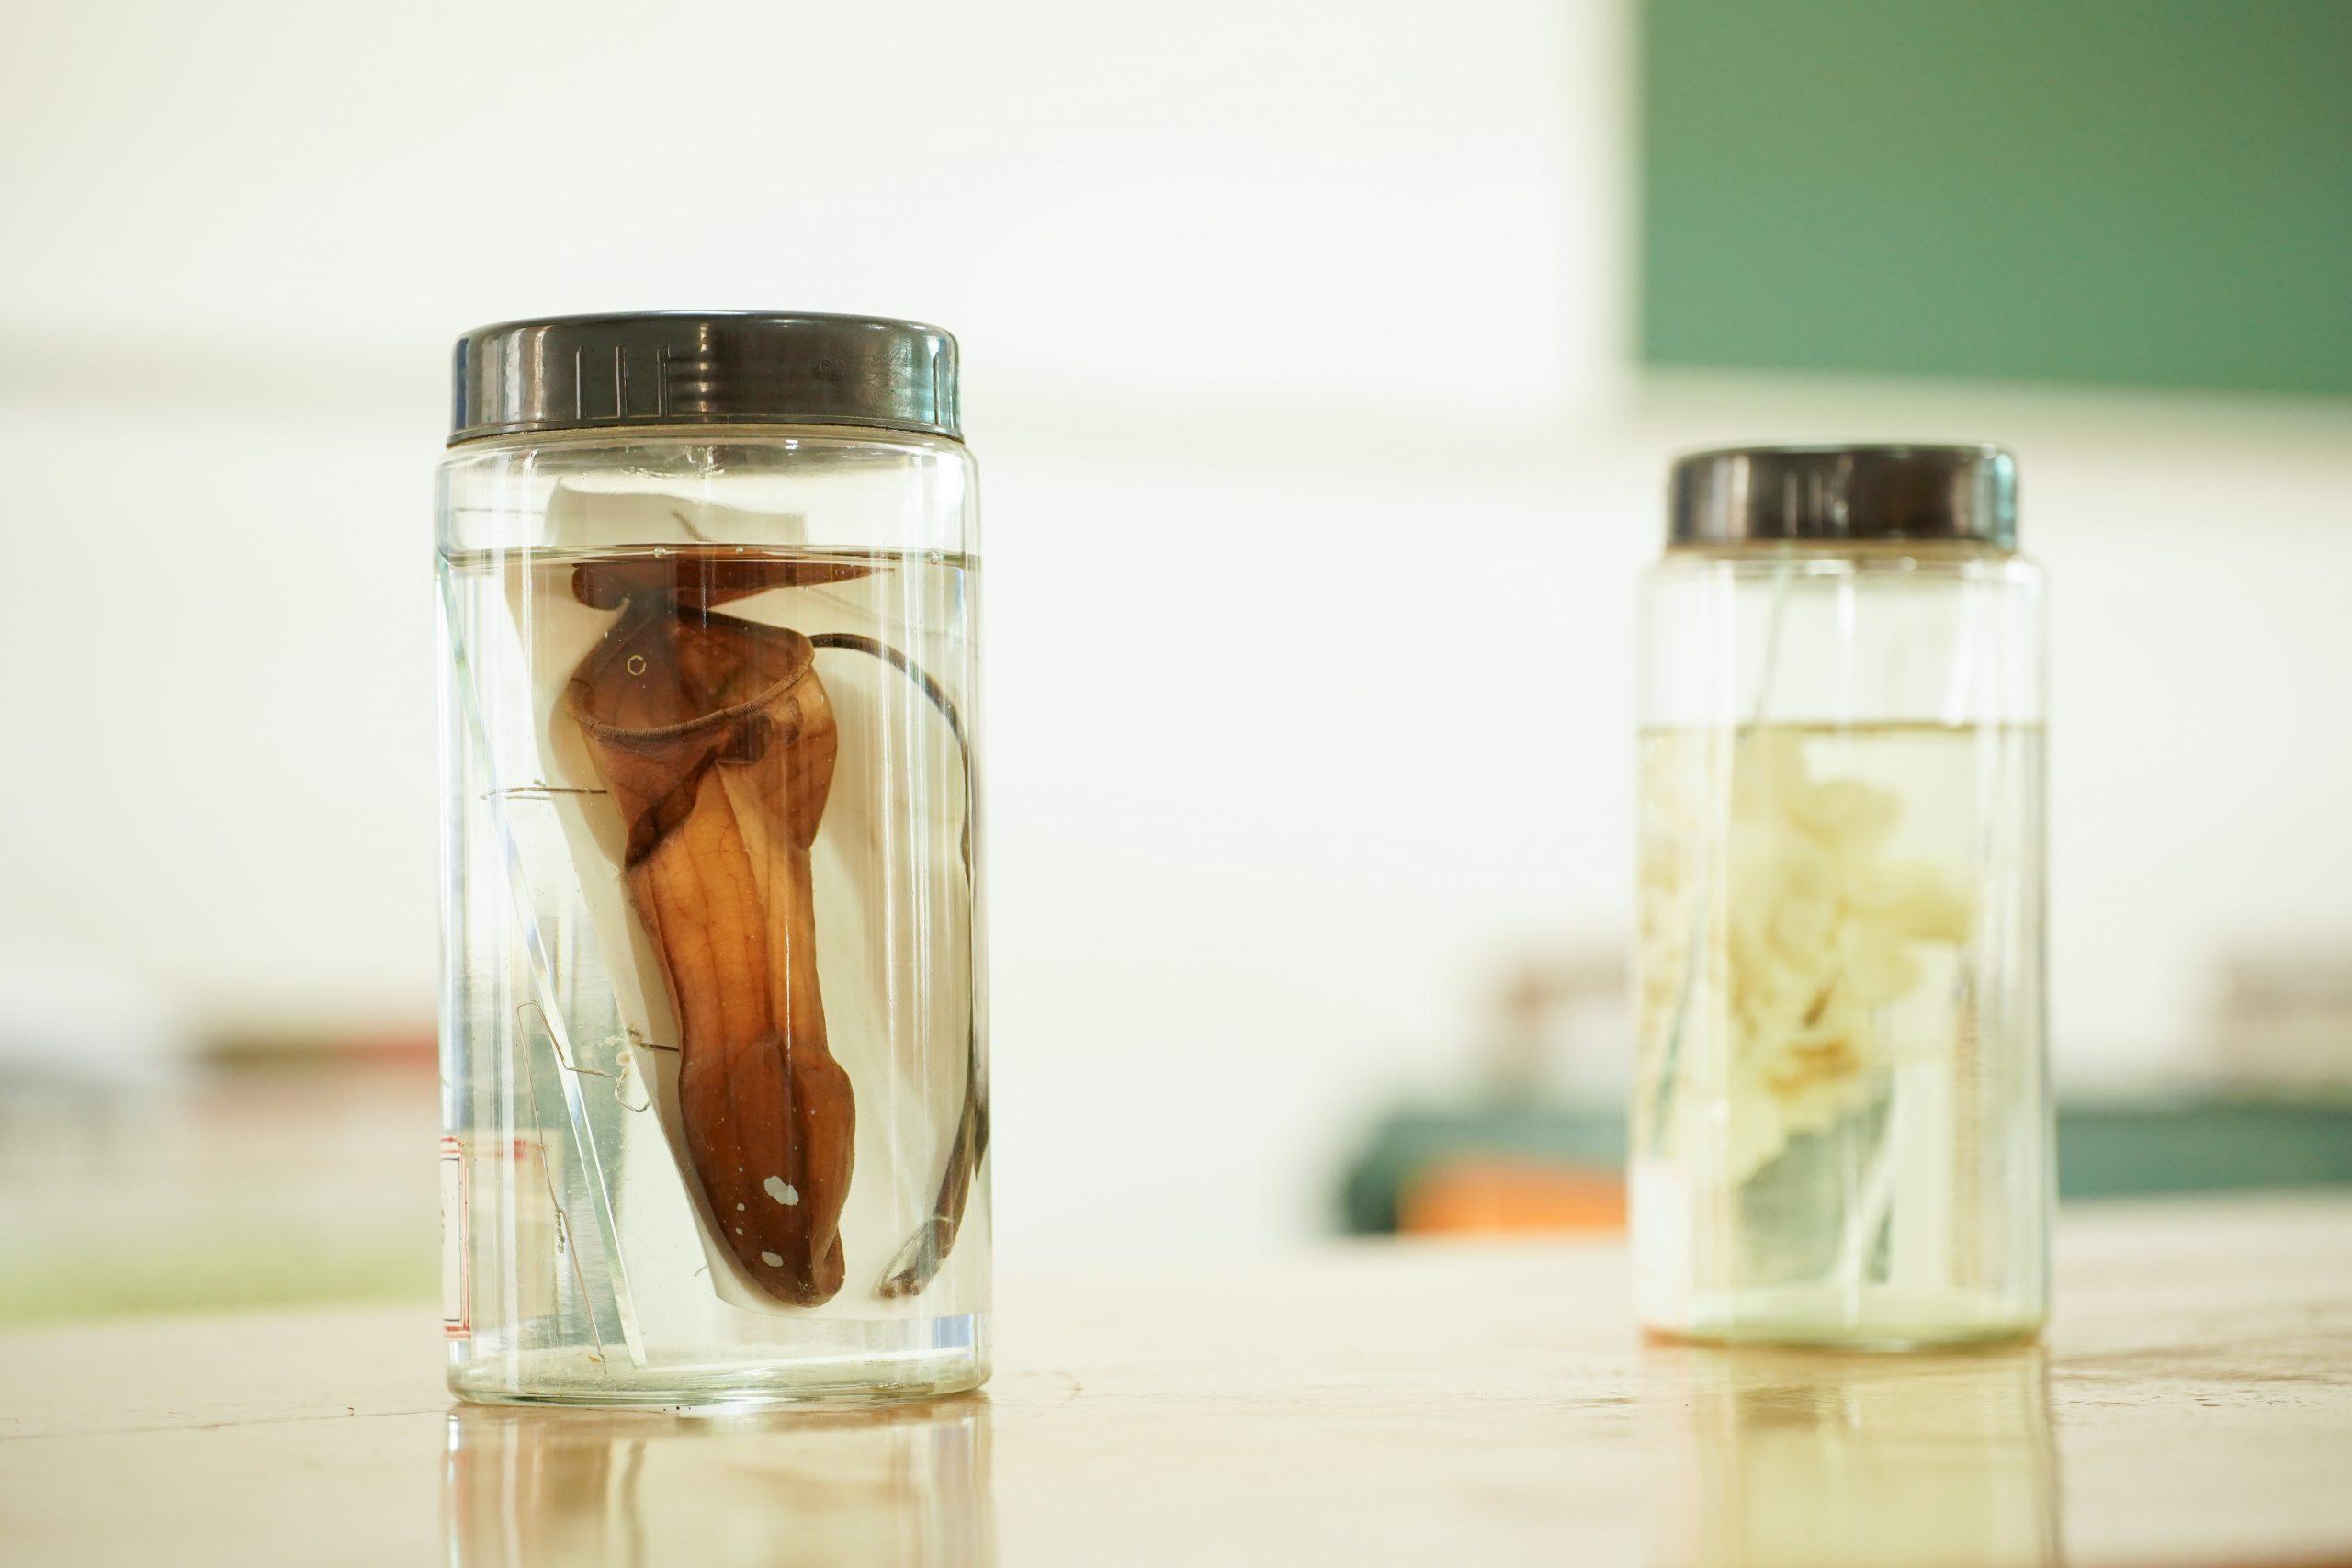 Specimen in a container